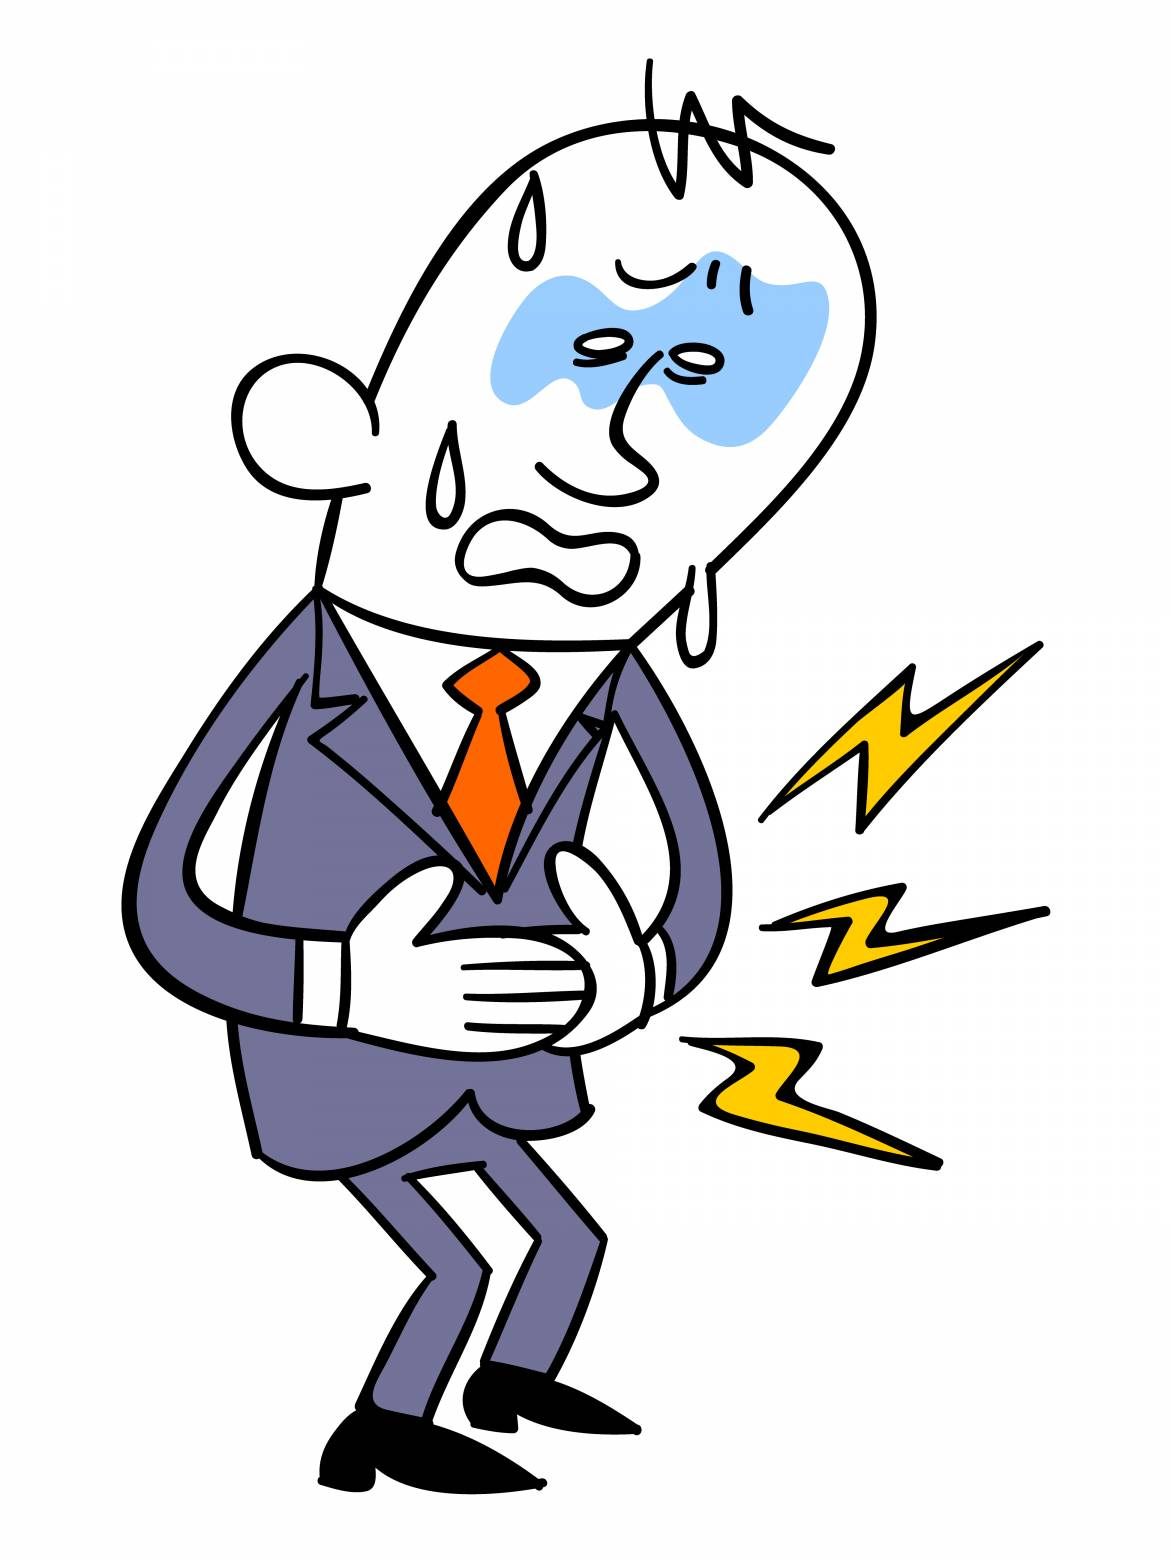 Gastroenteritis-the-ailment-and-its-symptoms-AllDayChemist-Health-Blog.jpg